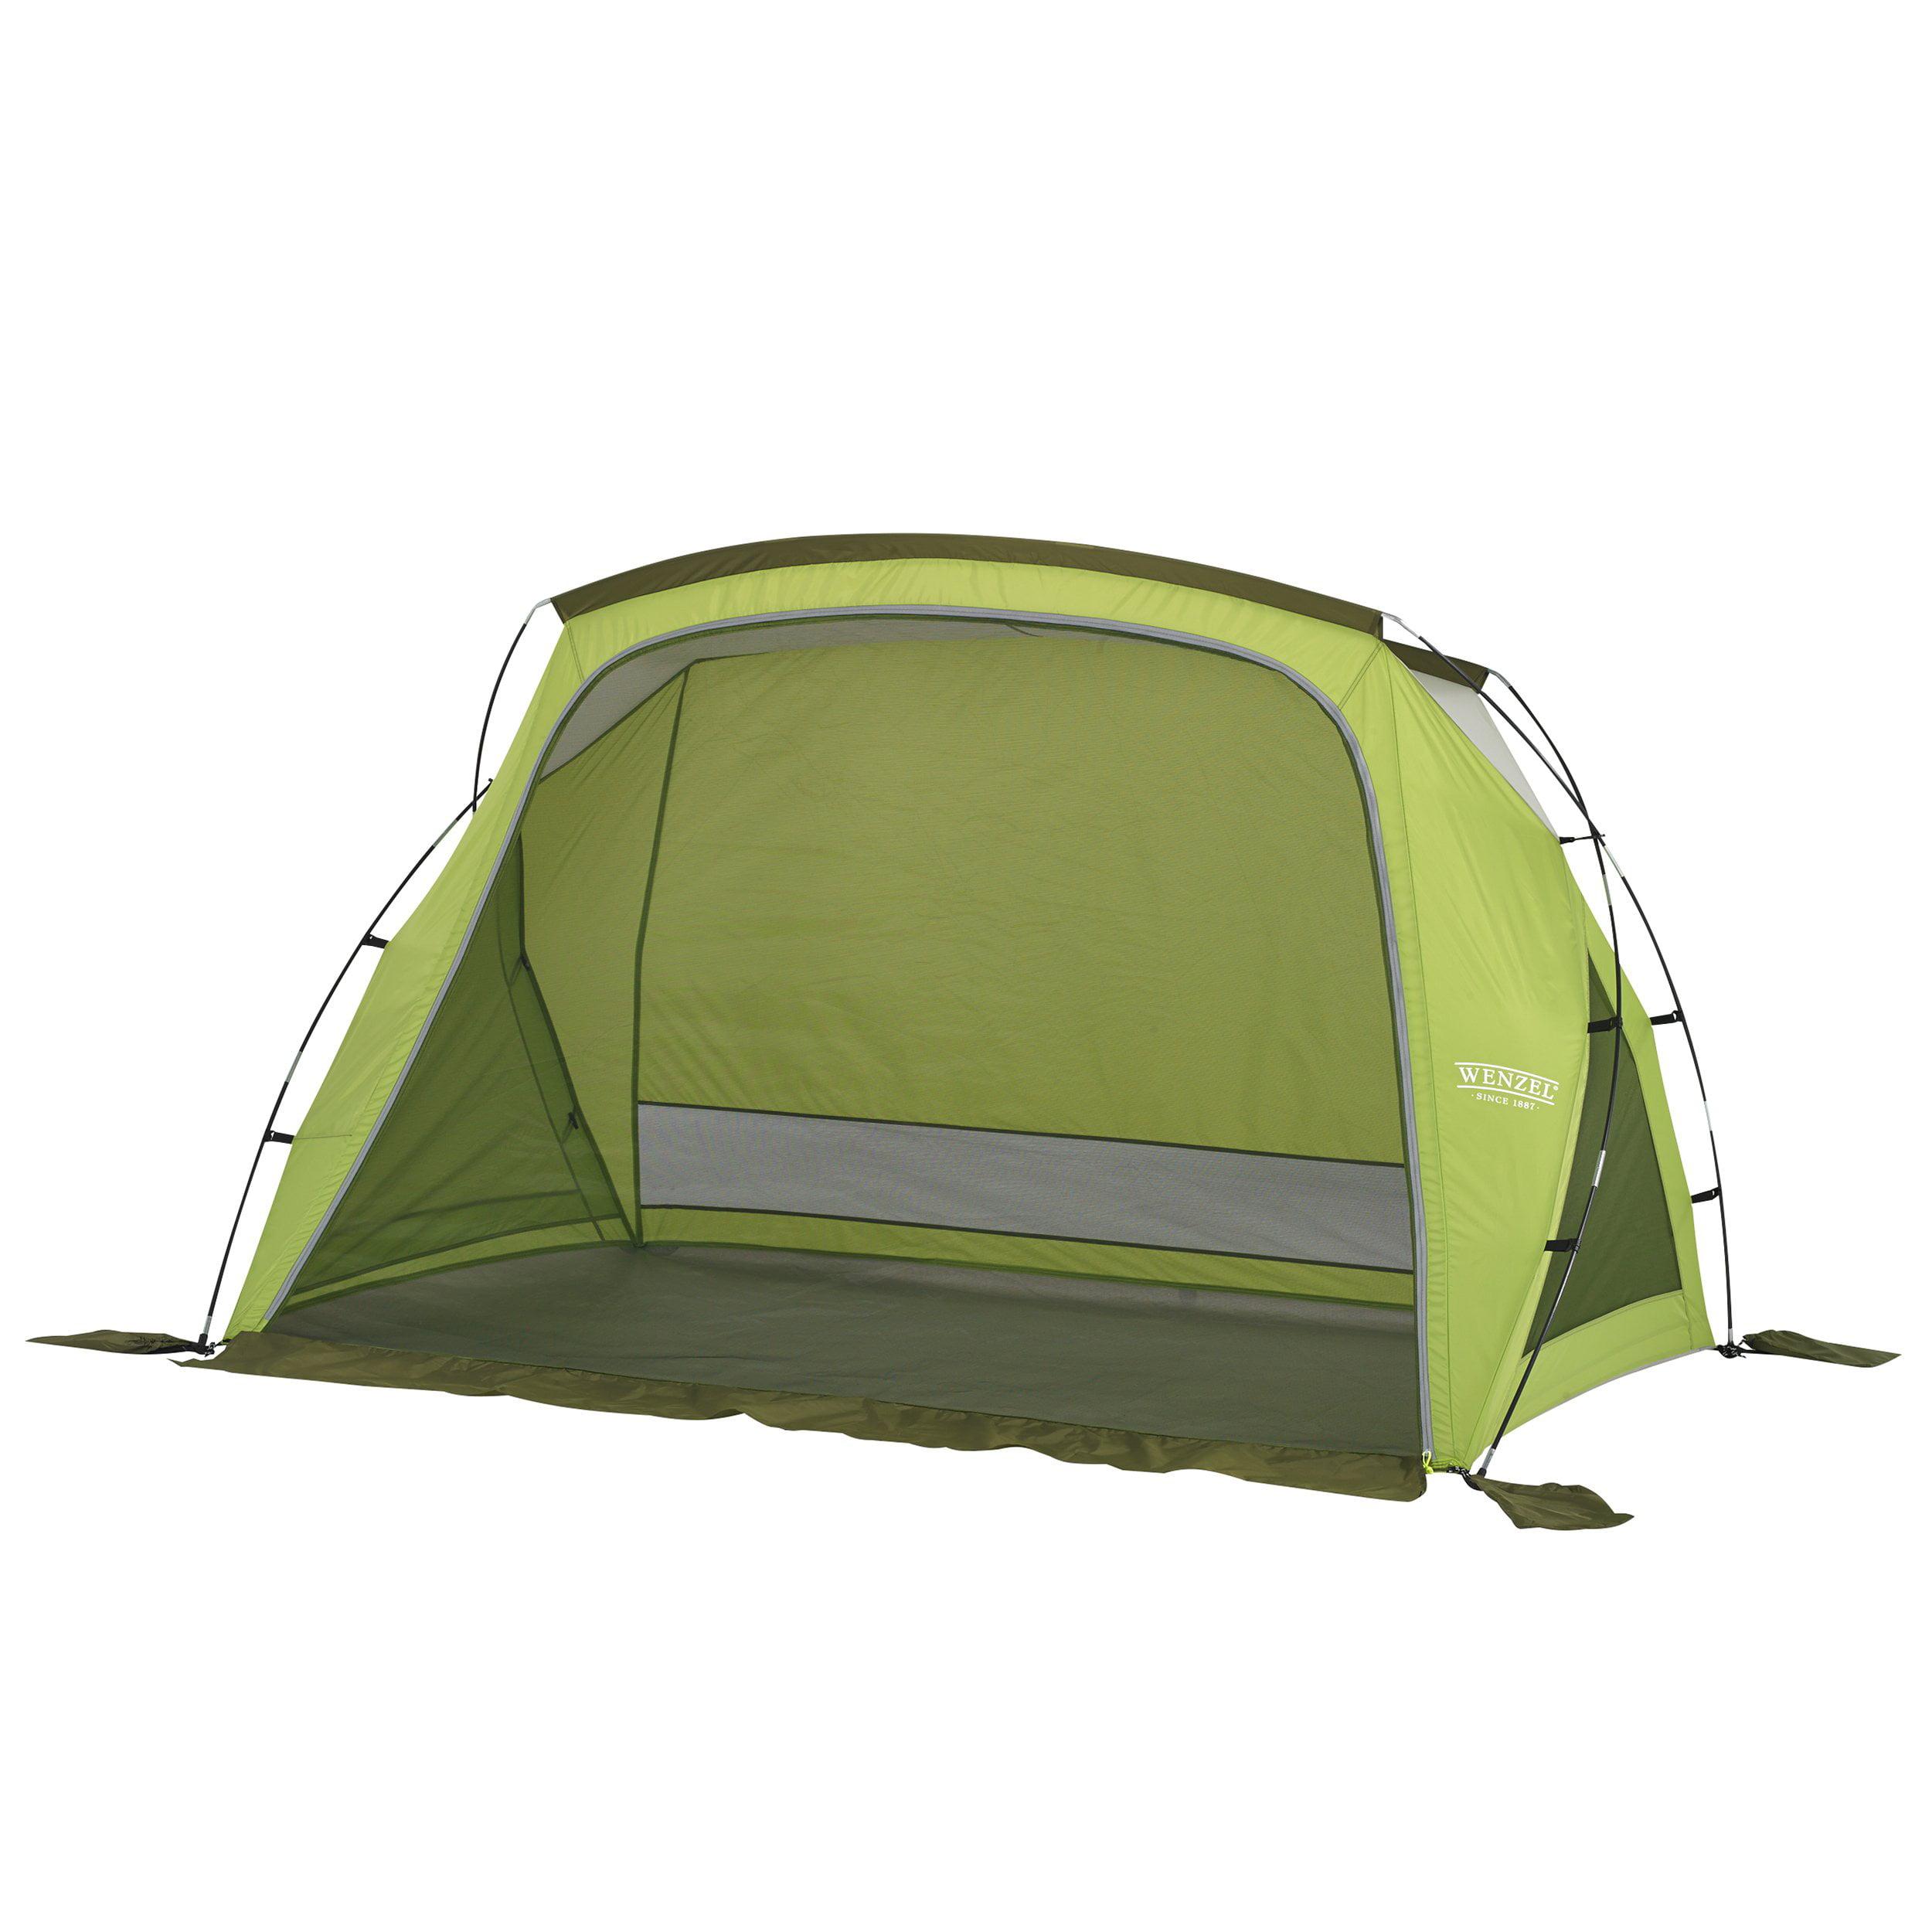 Wenzel Grotto Portable Outdoor Beach Camping Cabana Sun Shade Shelter, Green